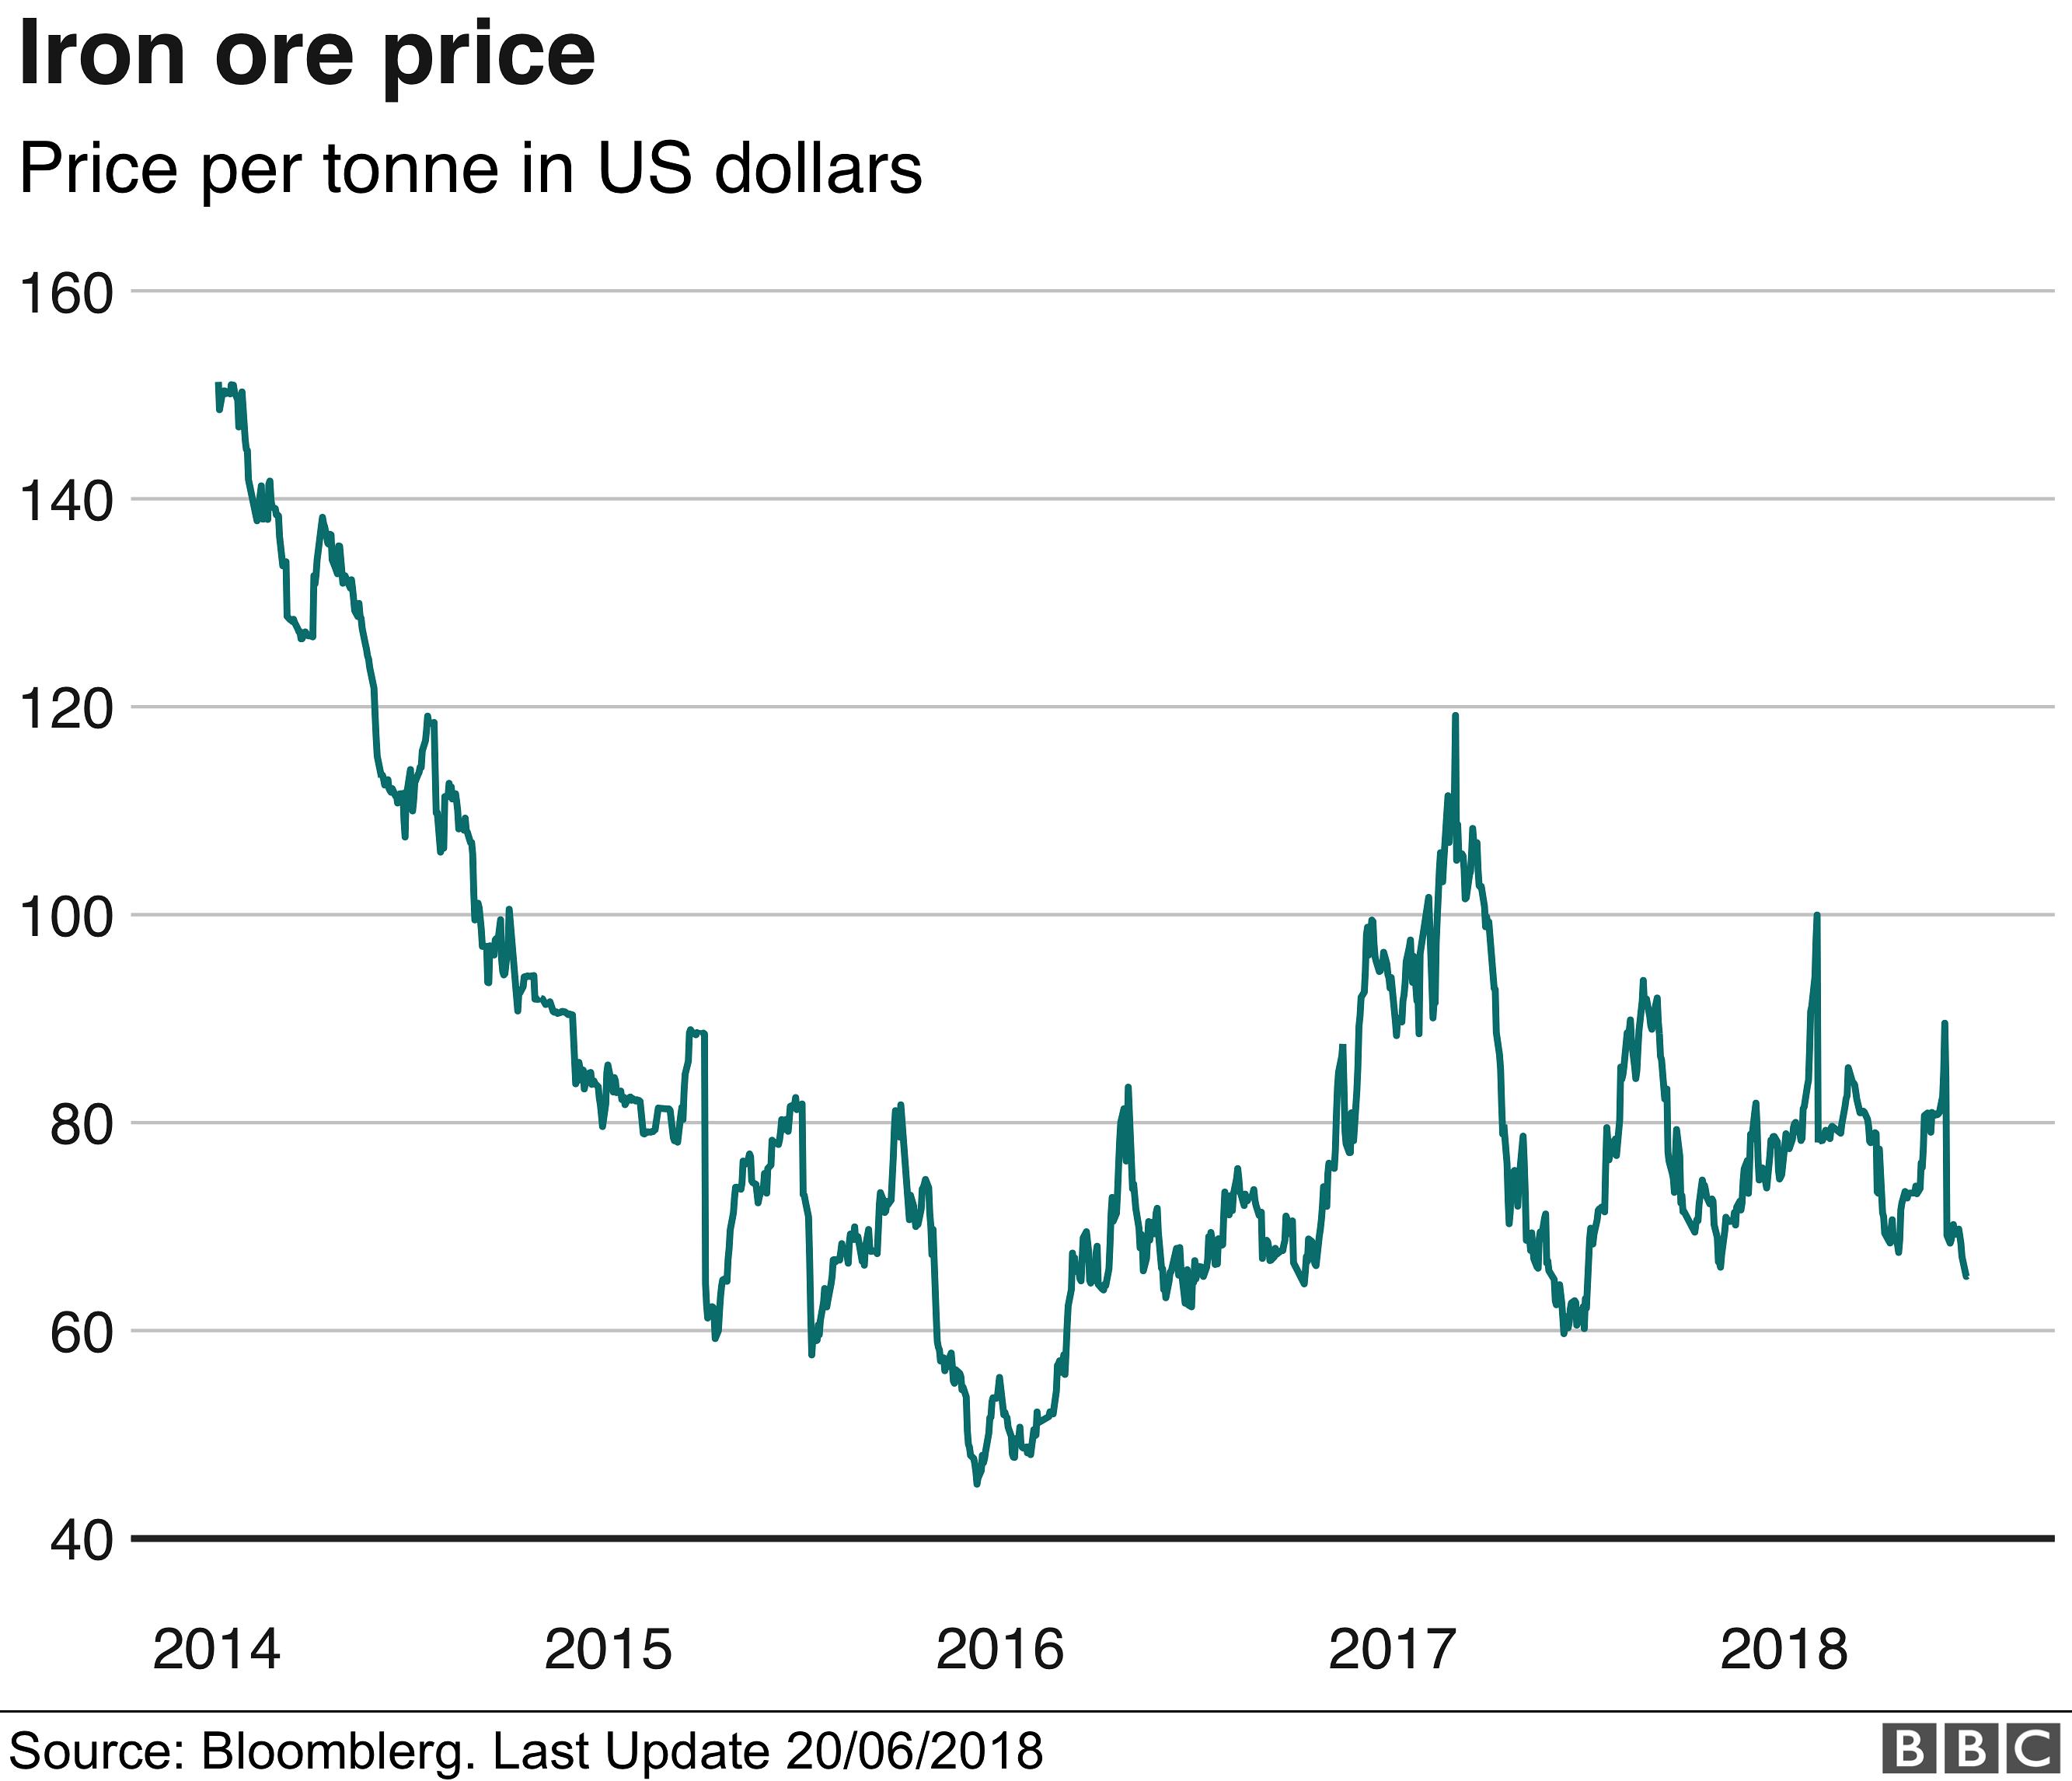 iron ore chart - US dollars per tonne